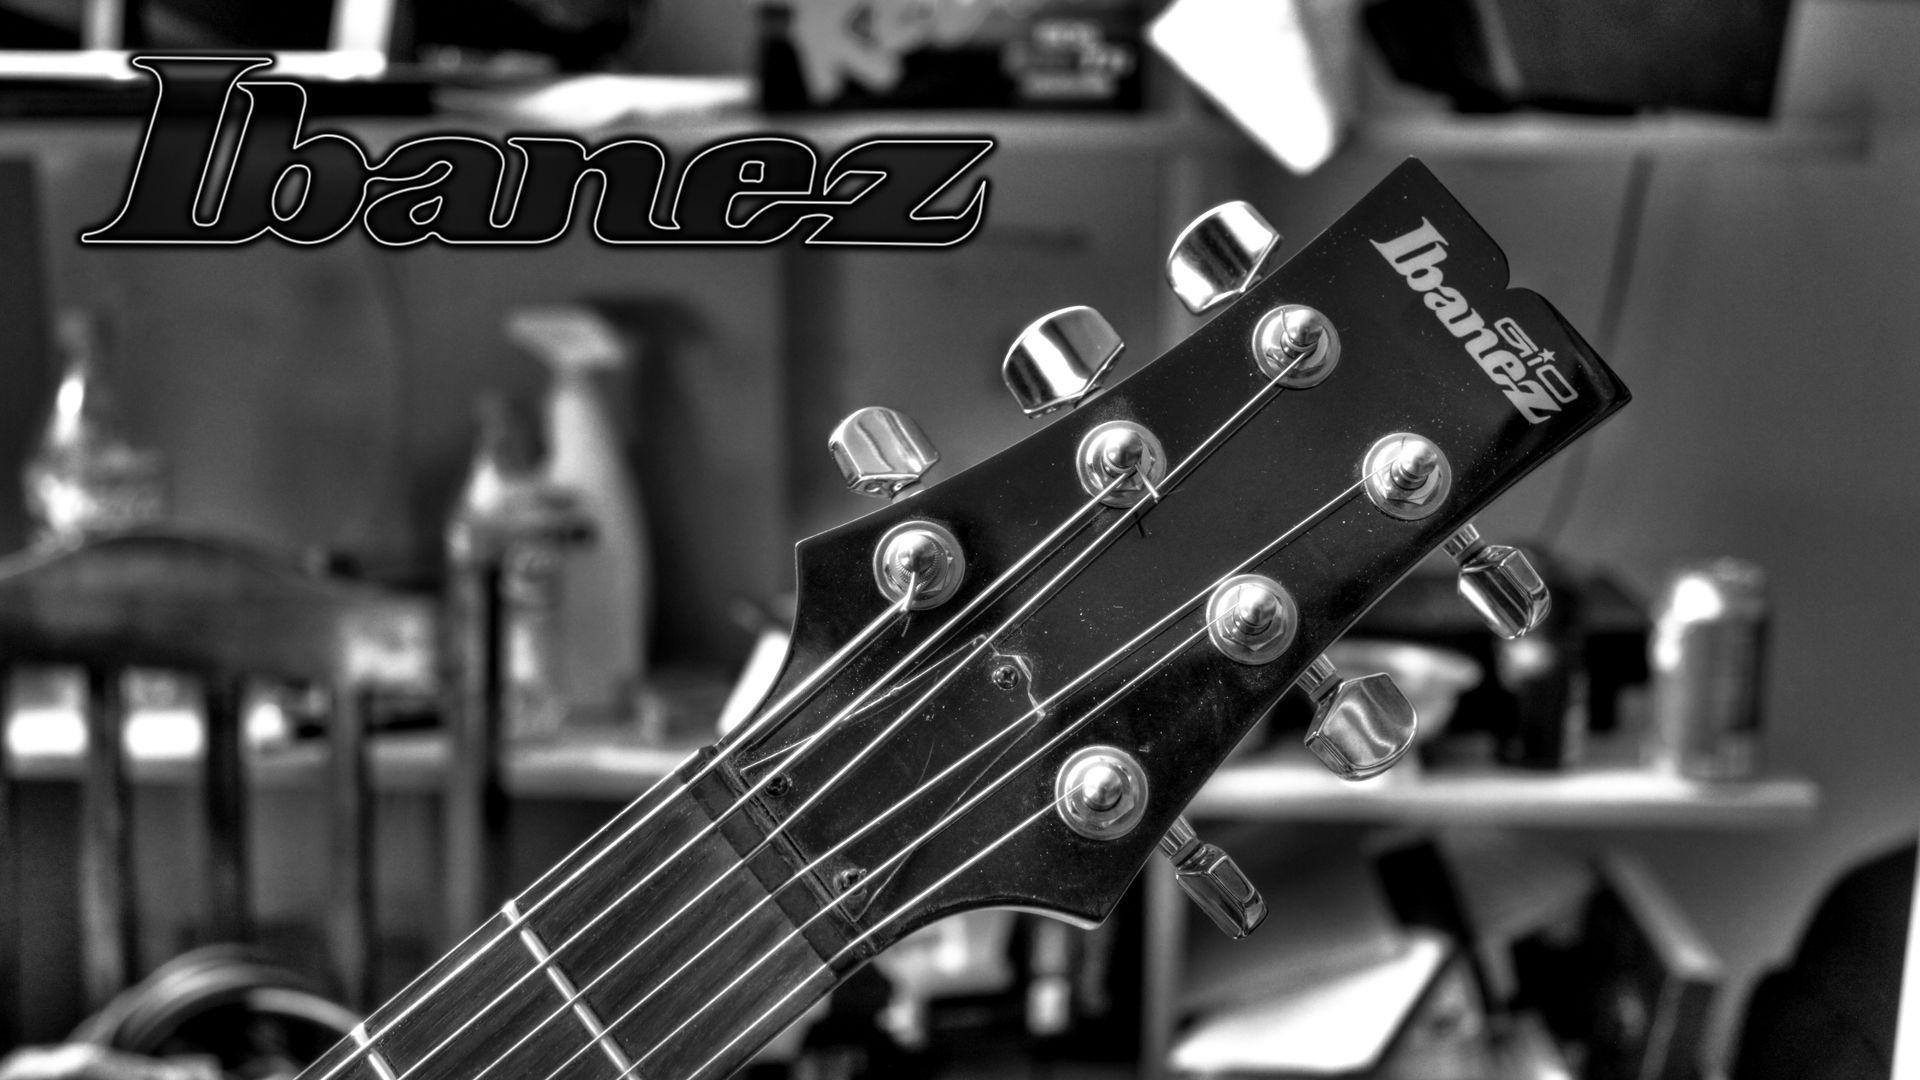 ibanez bass guitar wallpaperon -#main